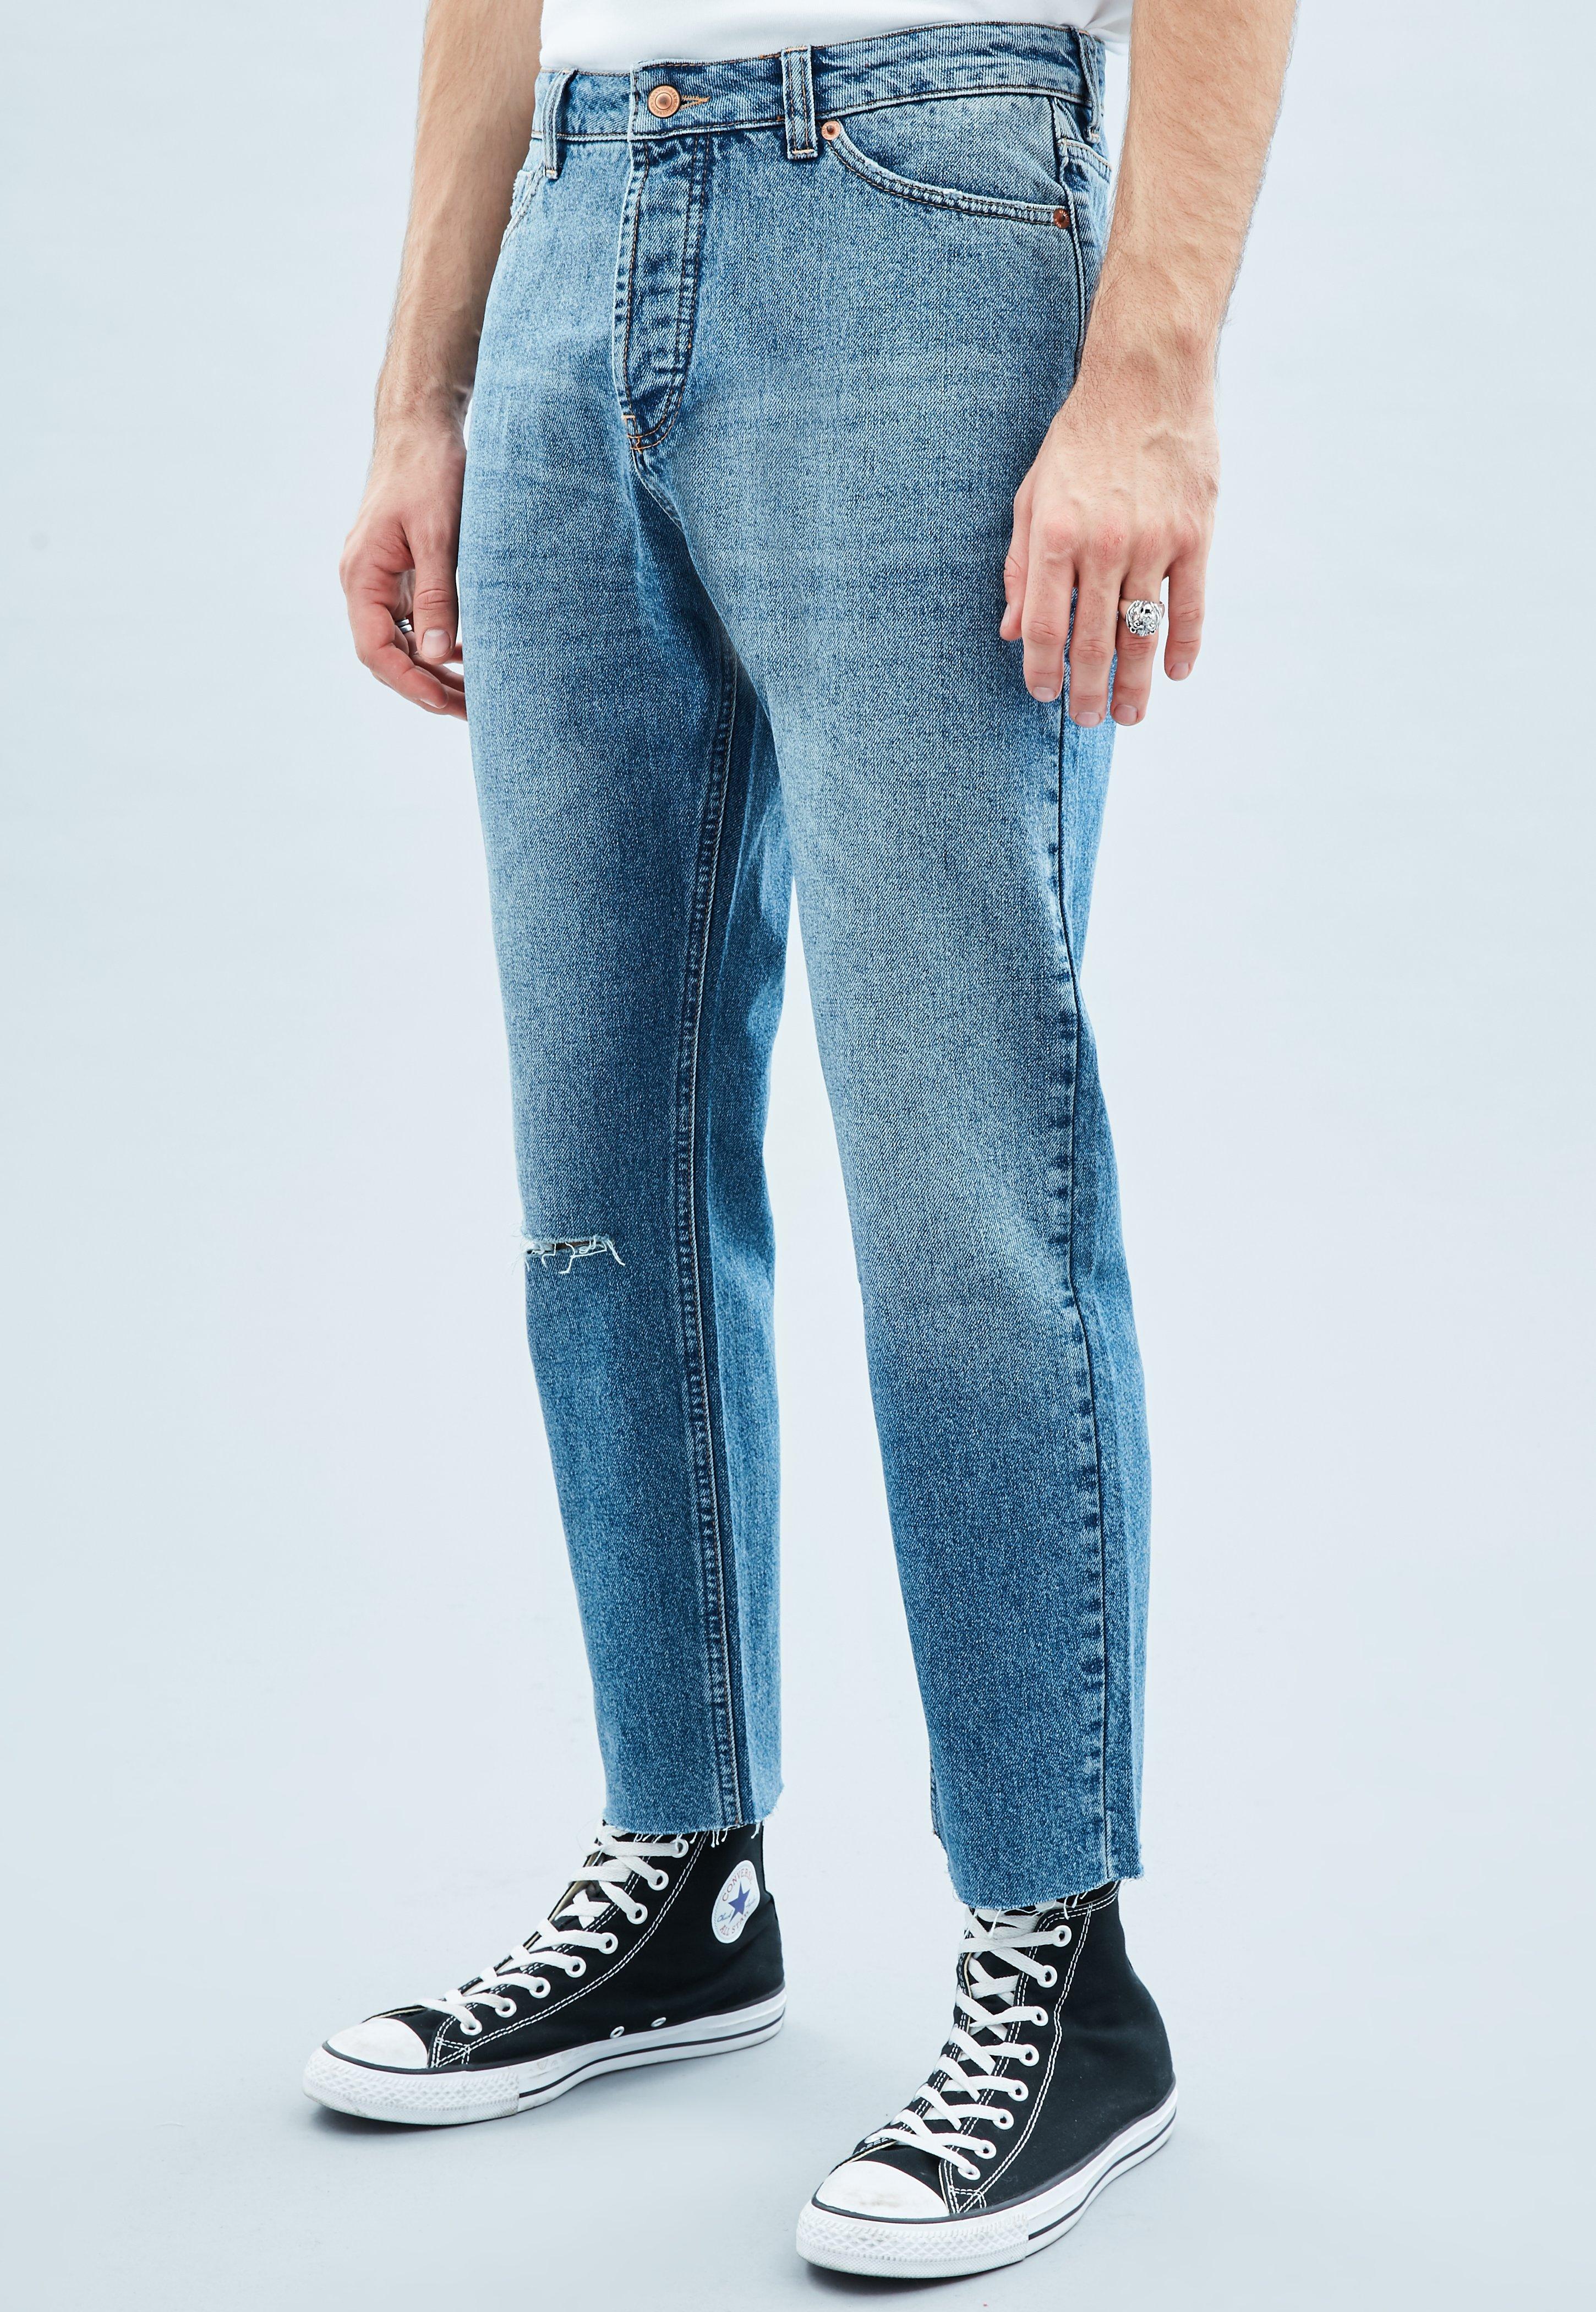 c0cf8992 Men's Jeans   Shop Denim Jeans for Men Online   Mennace